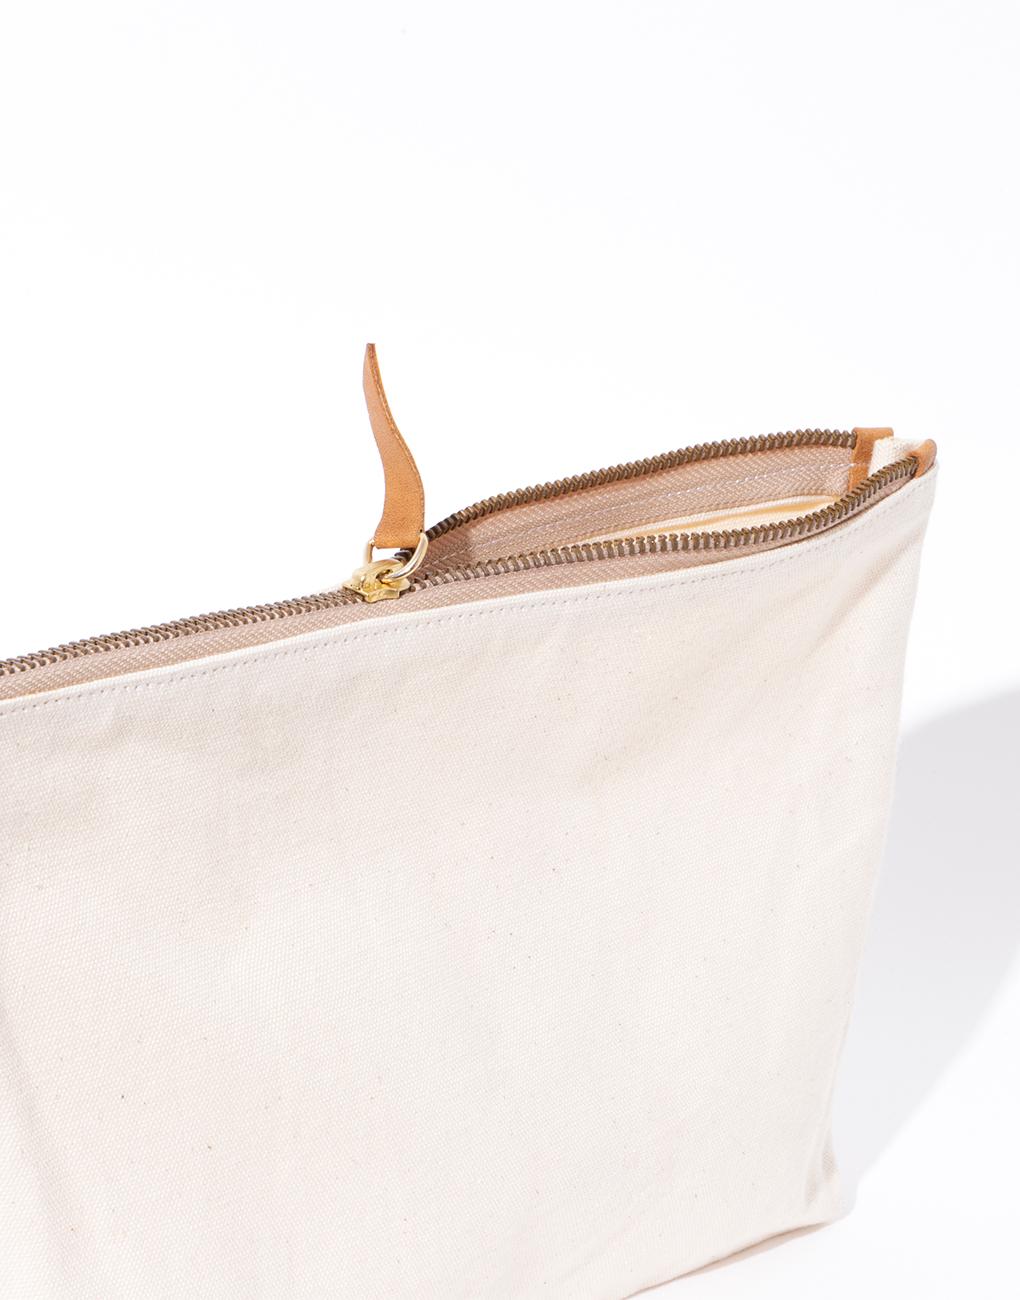 Meyelo-Small-Bag-White.jpg